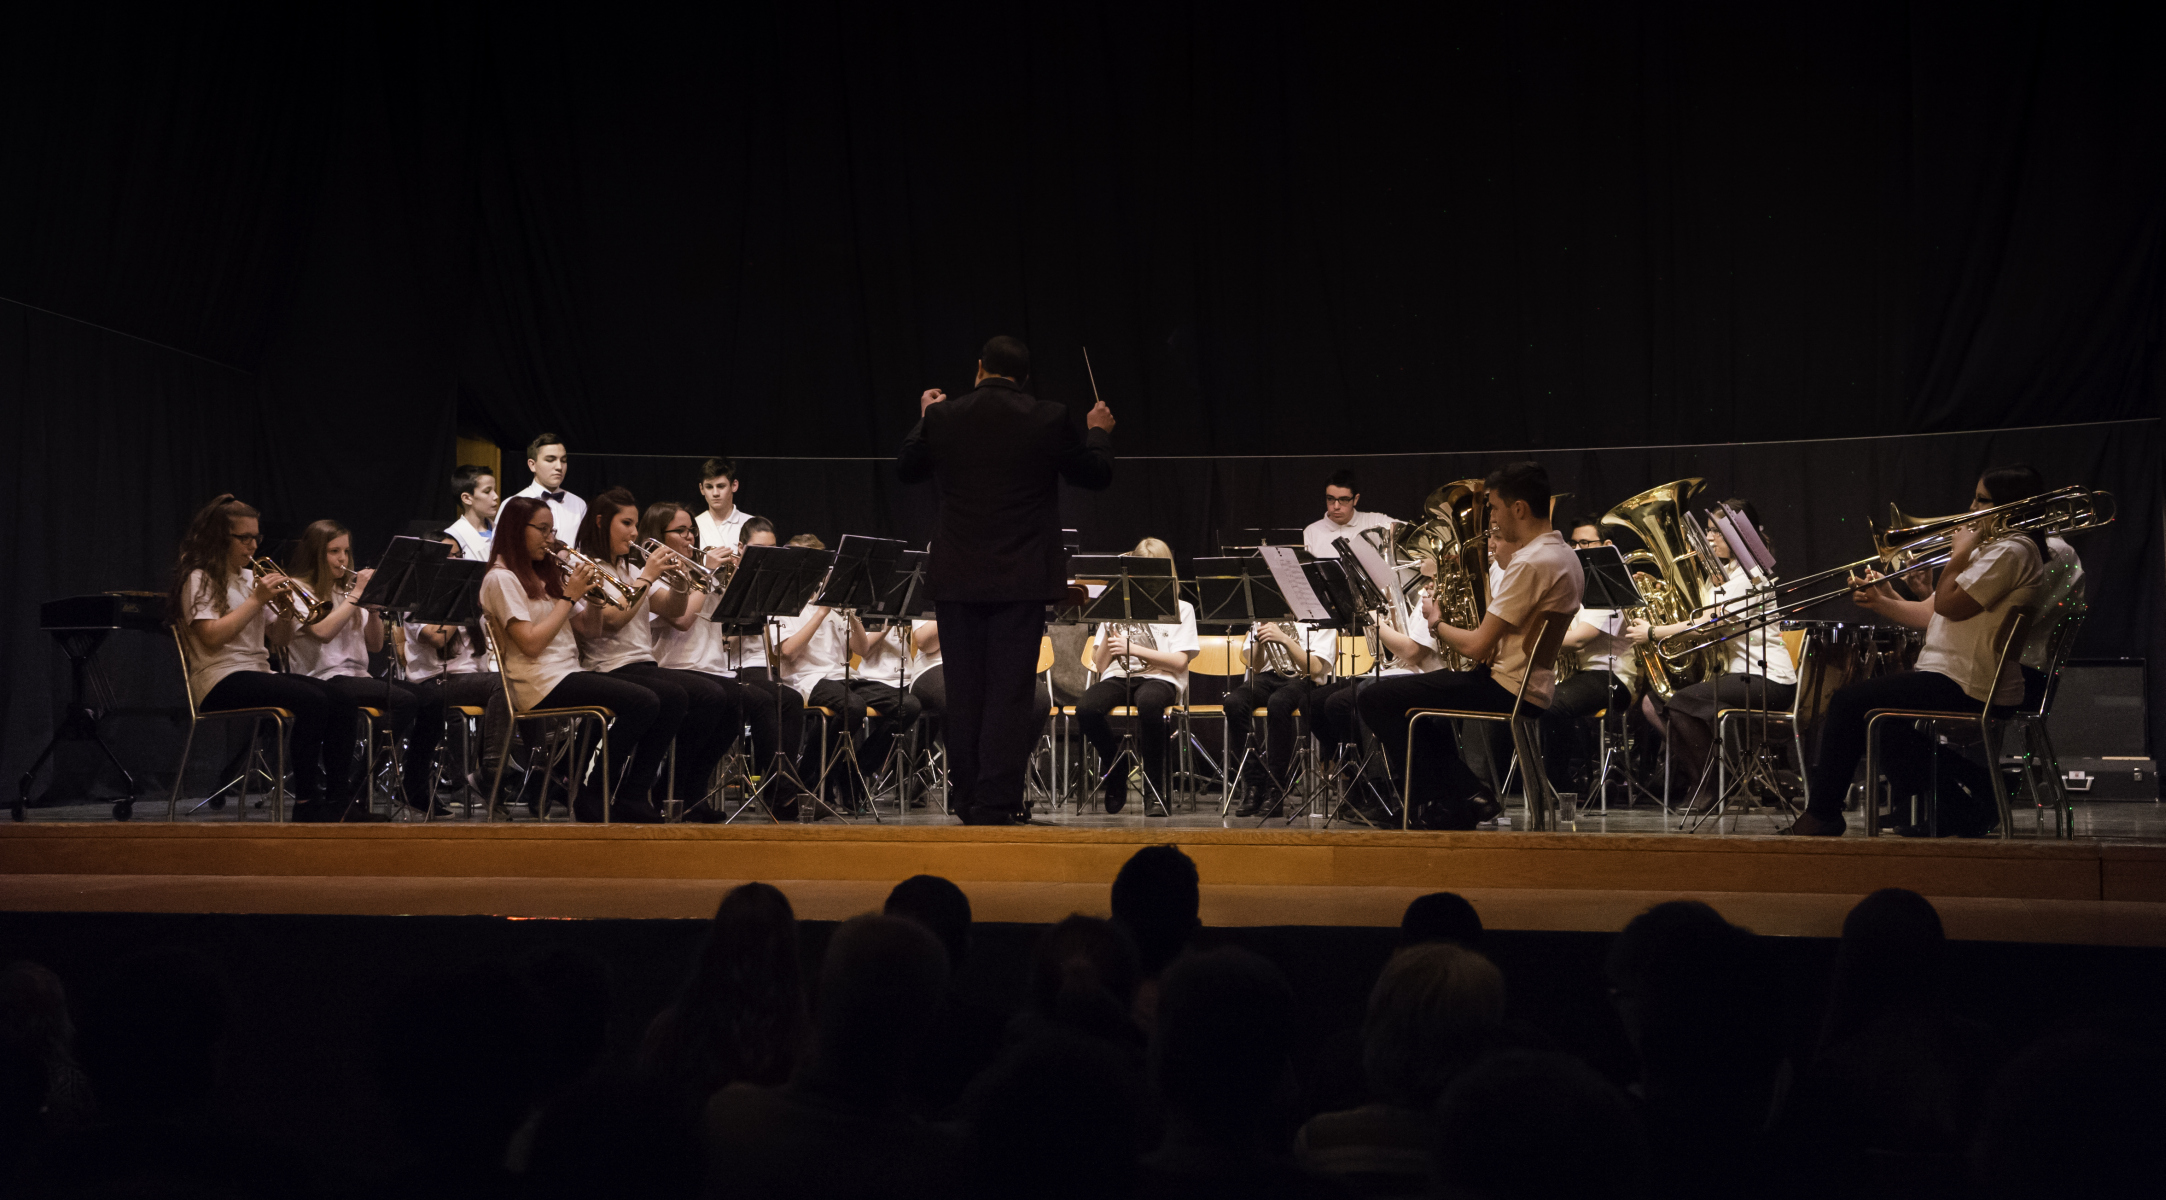 170211_concert_annuel17-018